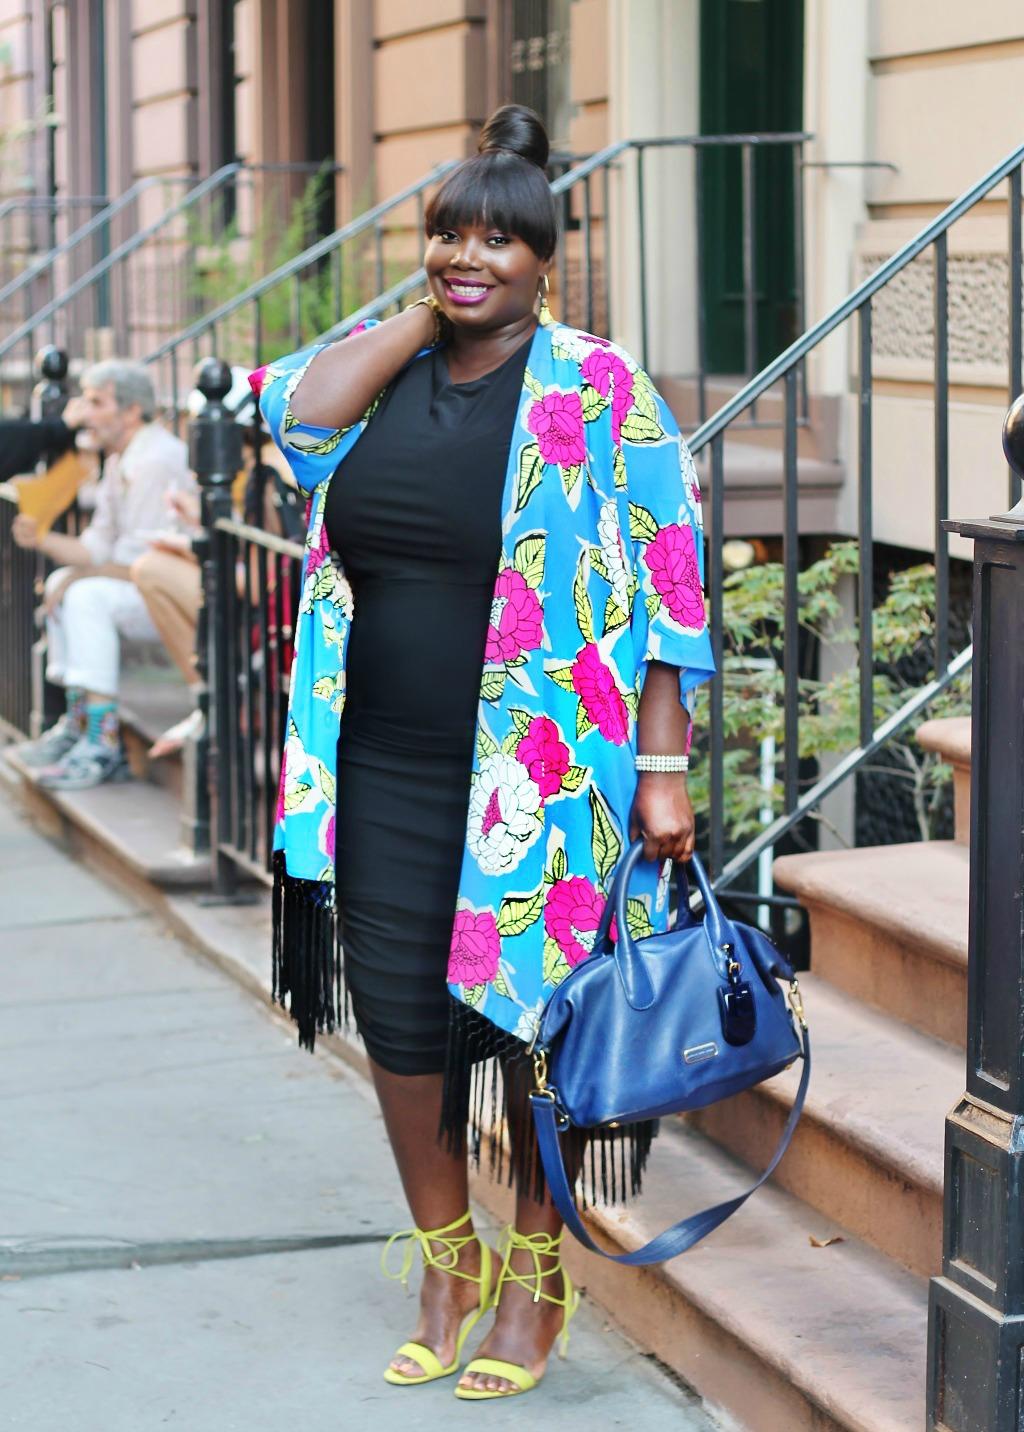 alissa-stylish-curves-in-melissa-mccarthy-kimono-for-new-york-fashion-week